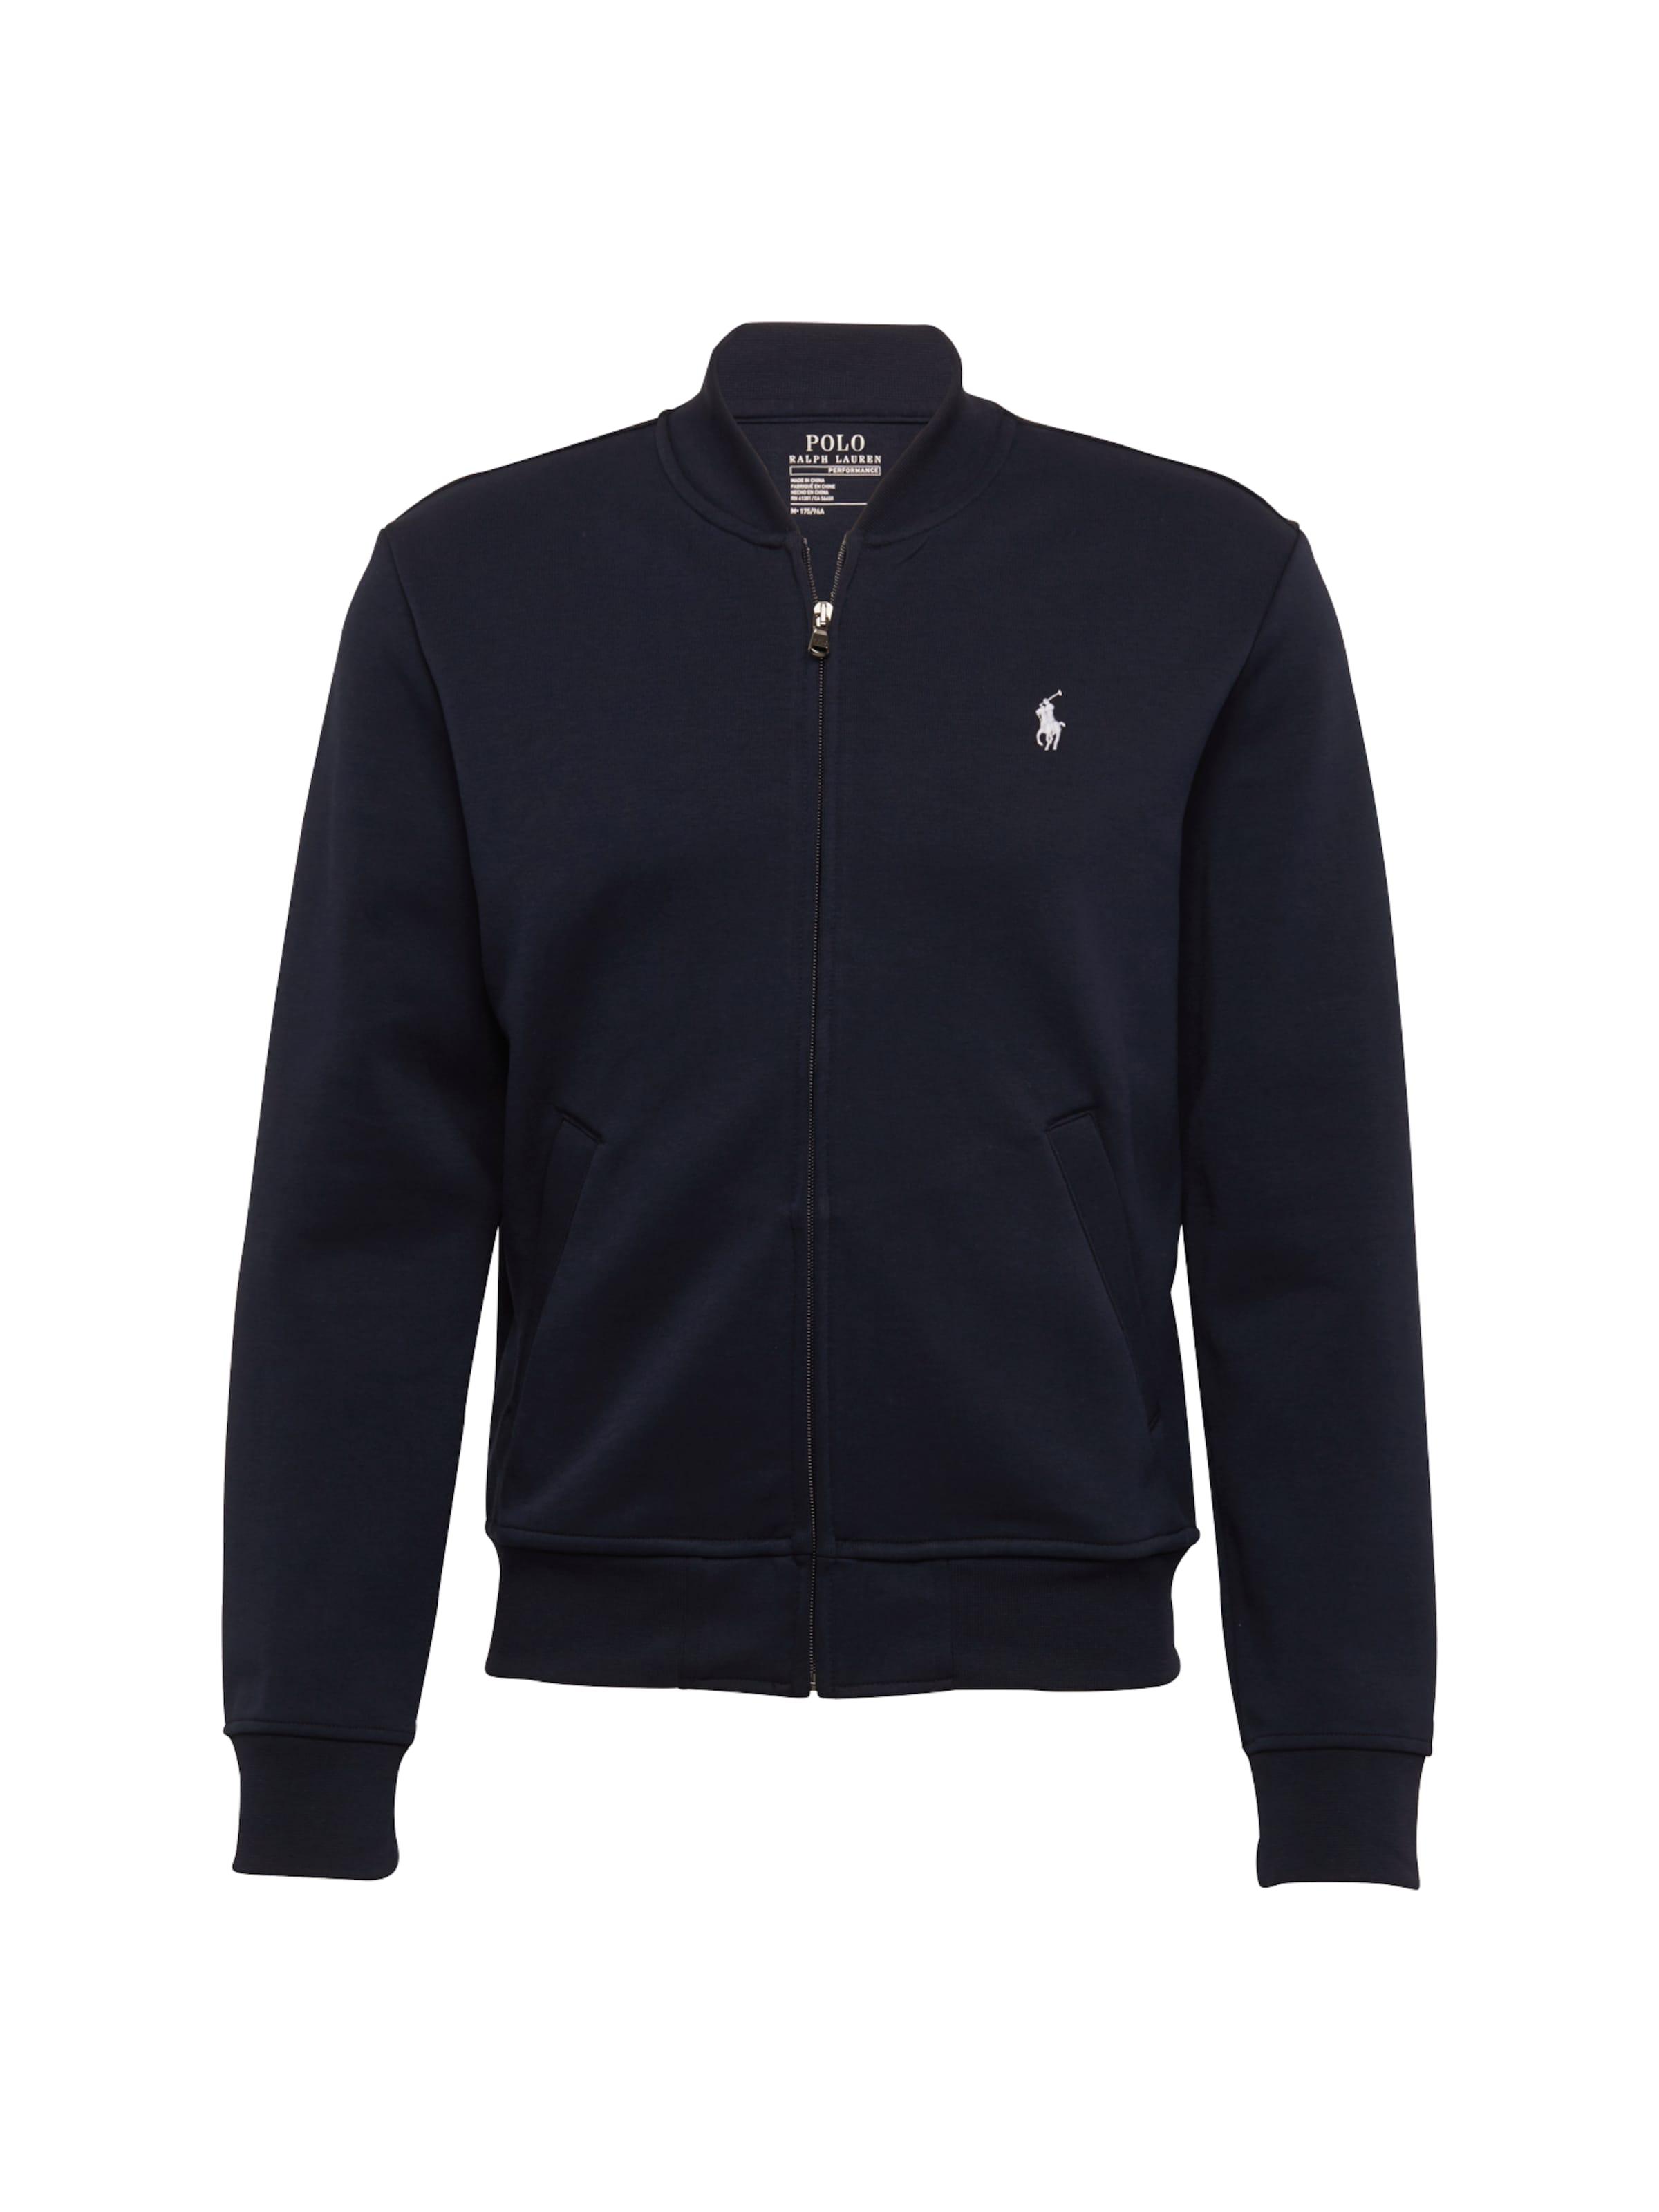 Ralph Survêtement long 'lsbomberm3 En De Sleeve knit' Marine Polo Bleu Lauren Veste N0wvnm8